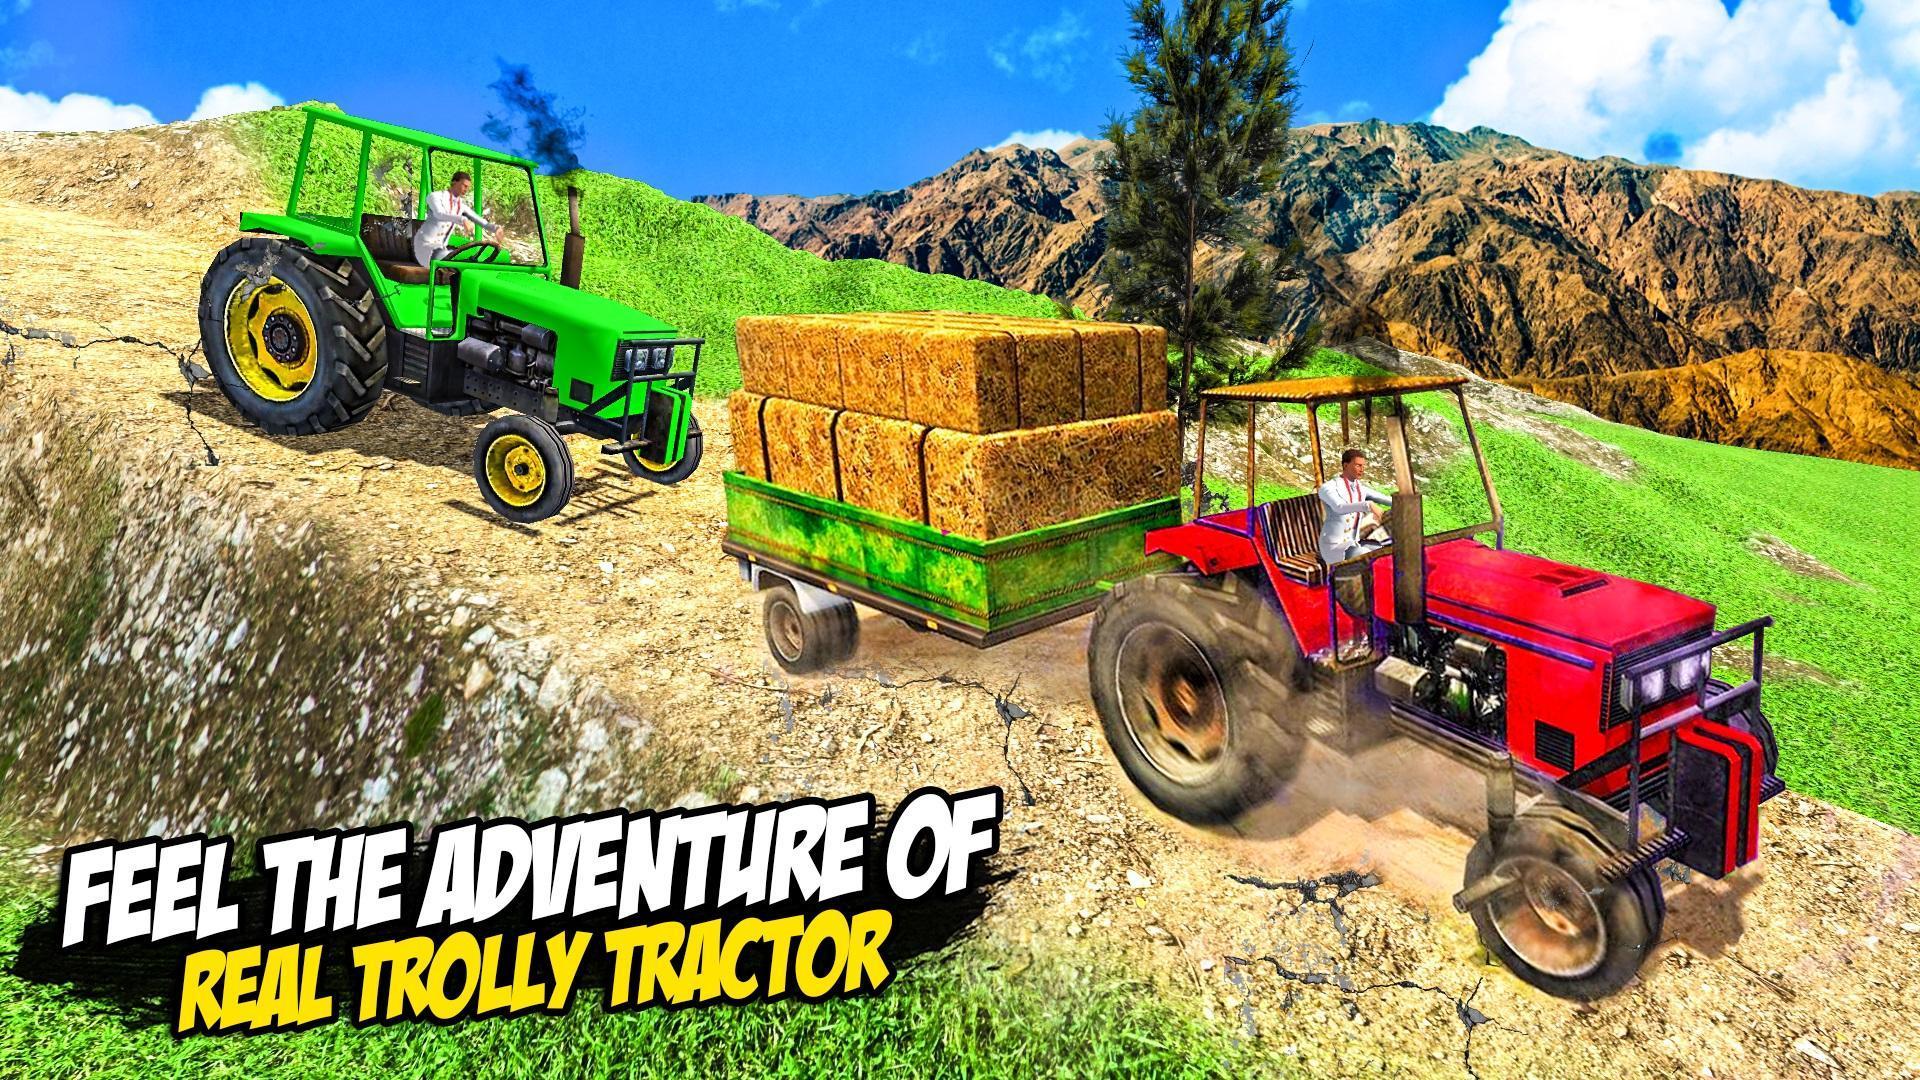 Heavy Tractor Trolley: Tractor Cargo Simulator🚜🚜 3.1 Screenshot 13